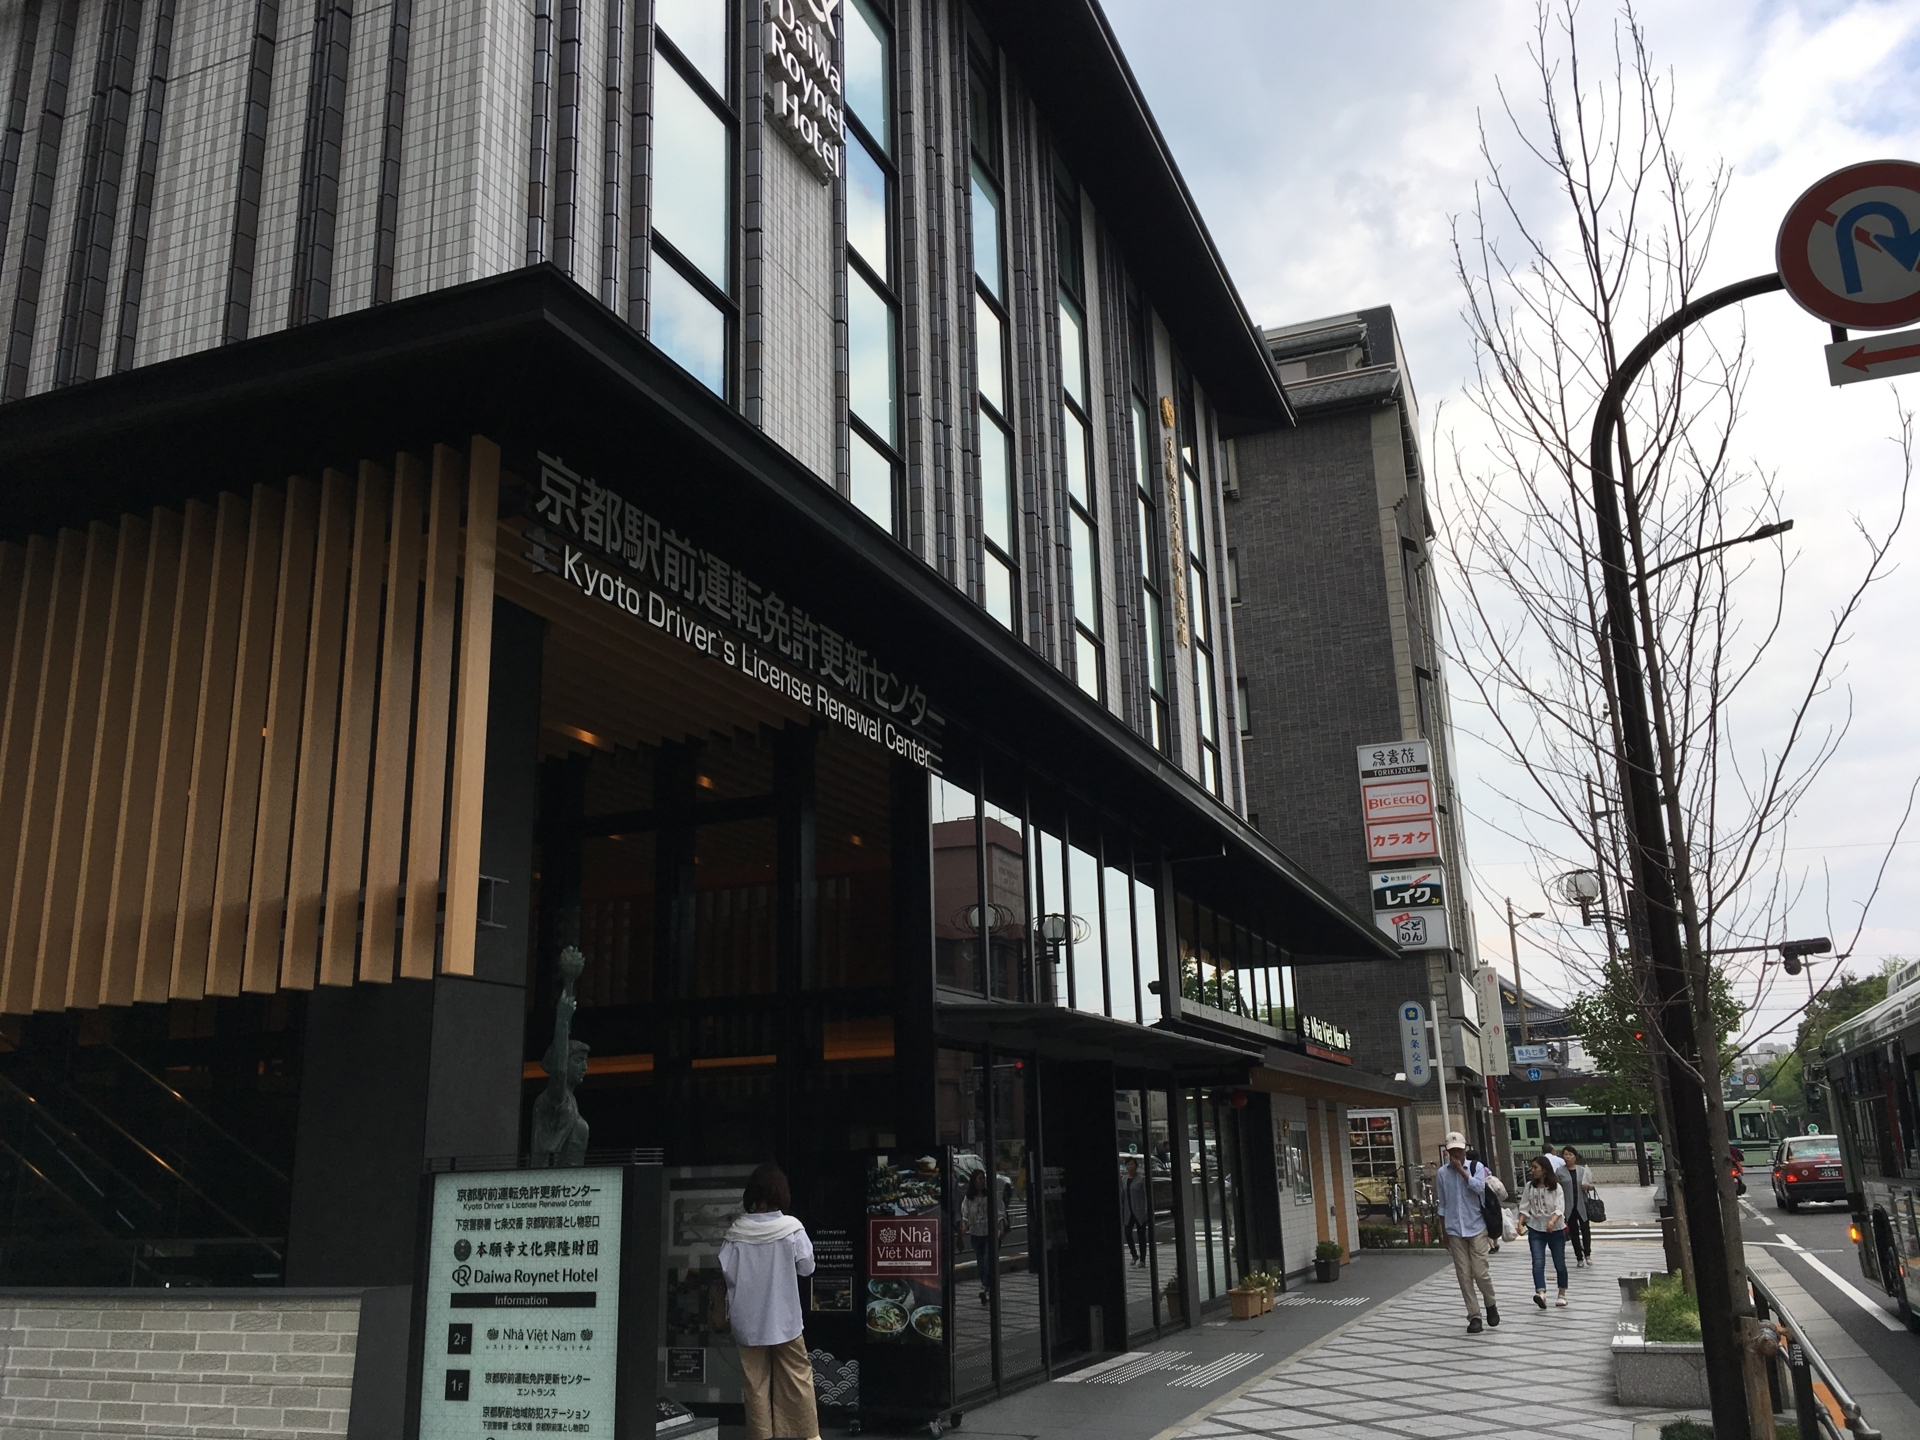 京都駅前運転免許更新センター